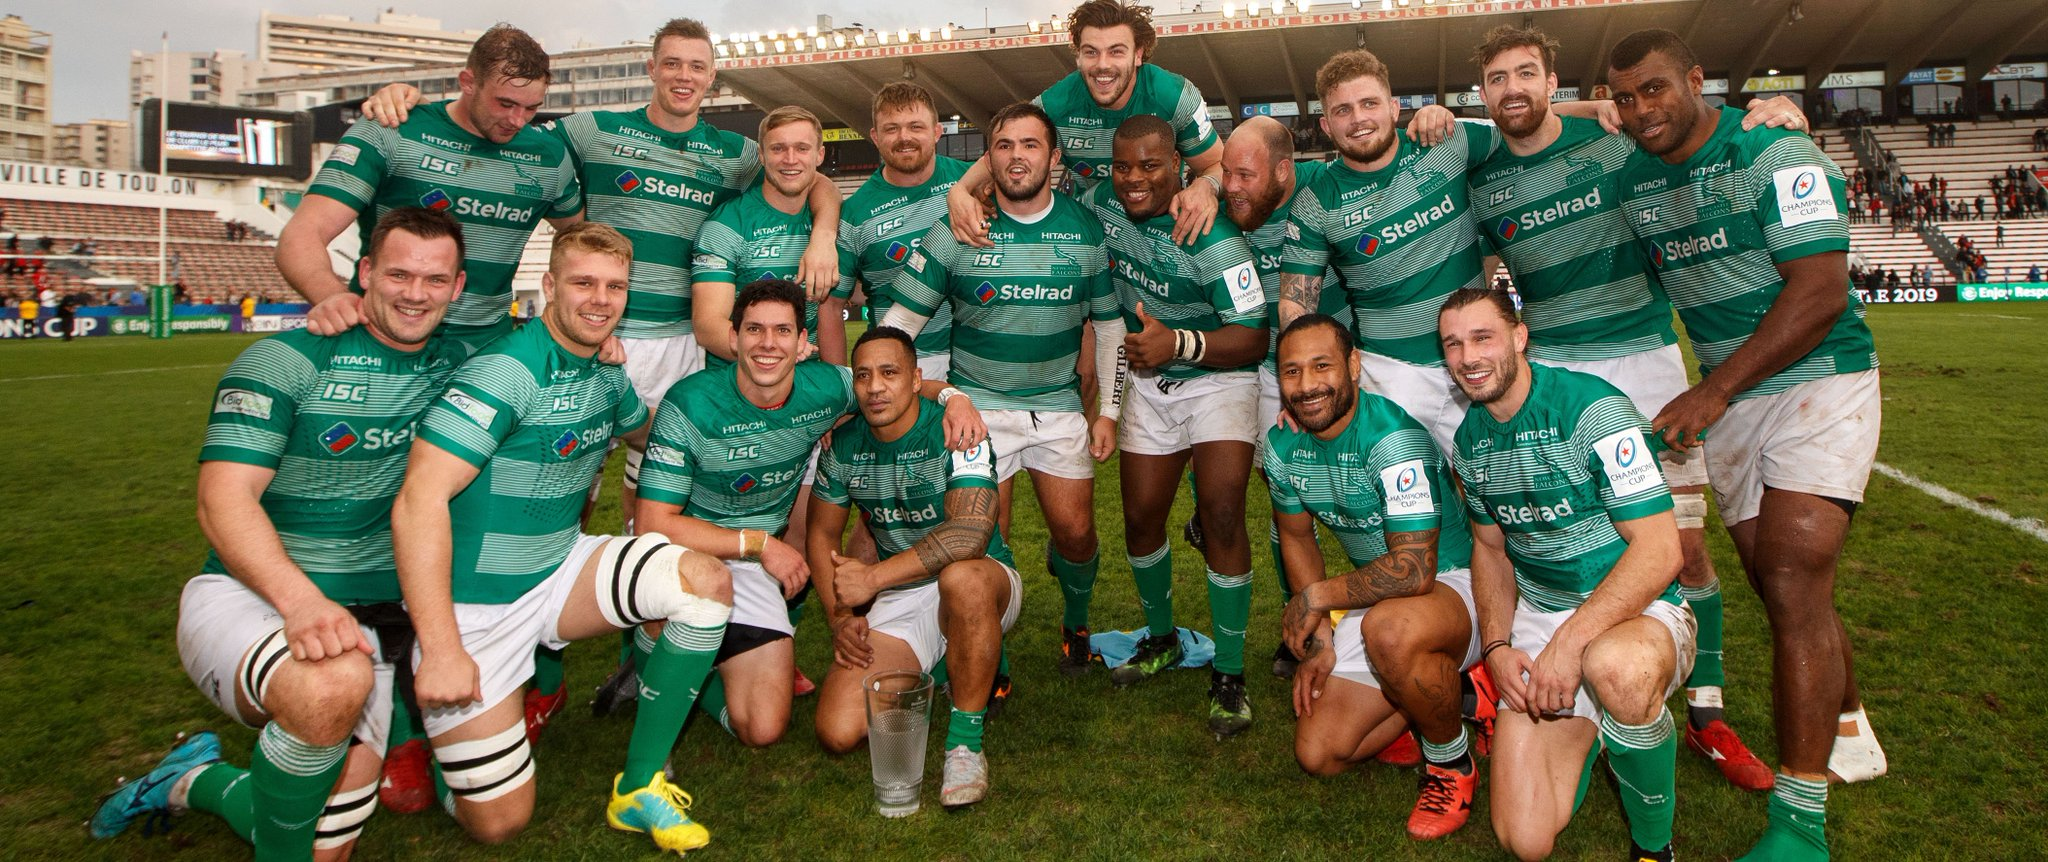 Newcastle Falcons team